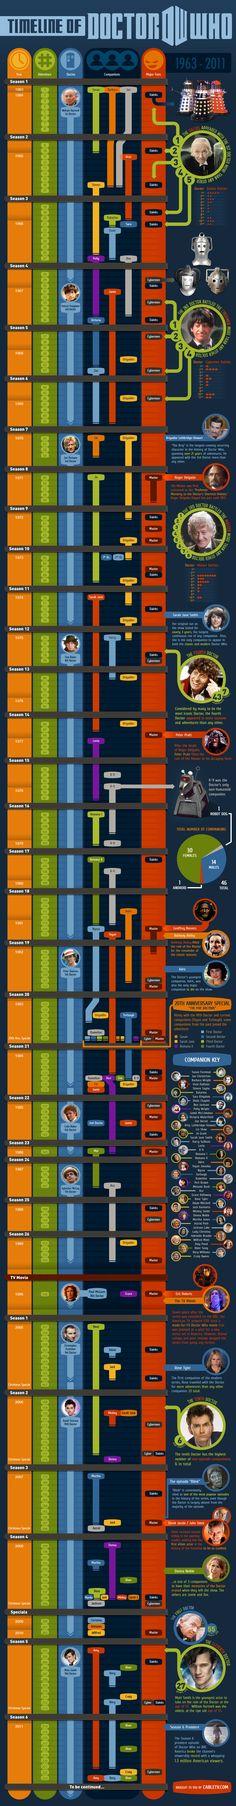 Doctor who timeline